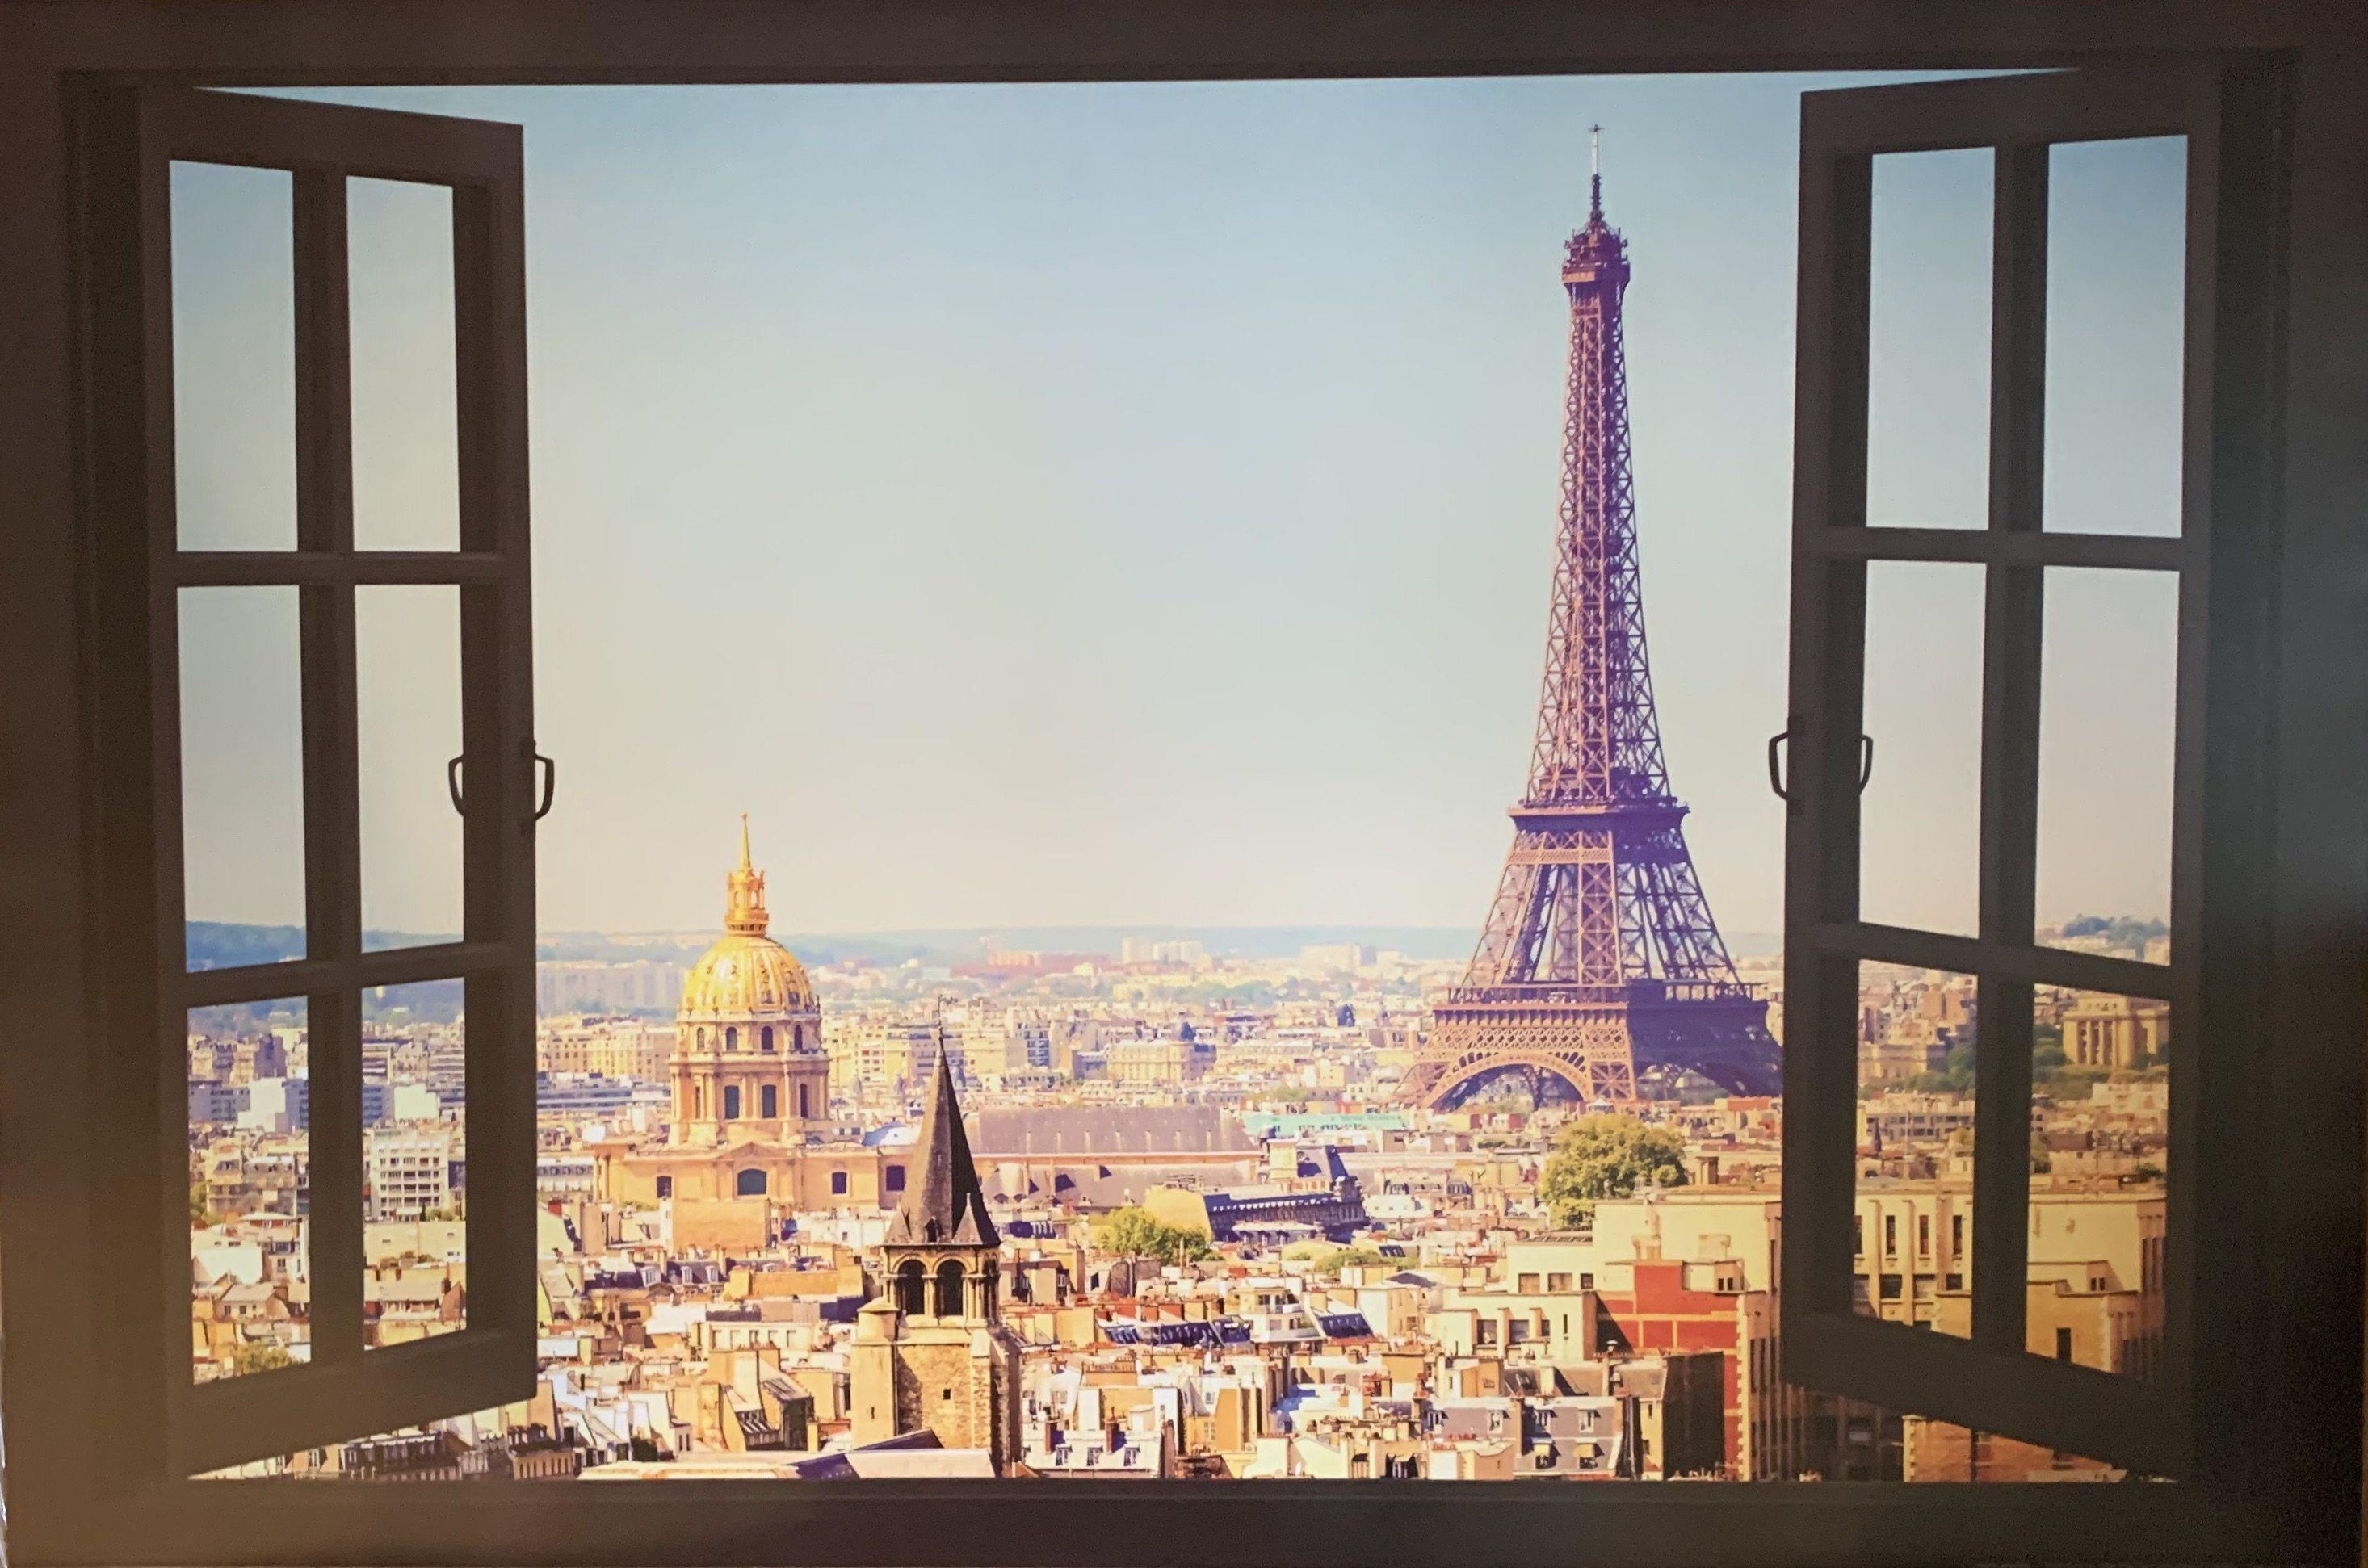 eiffel tower window view poster 24 x 36